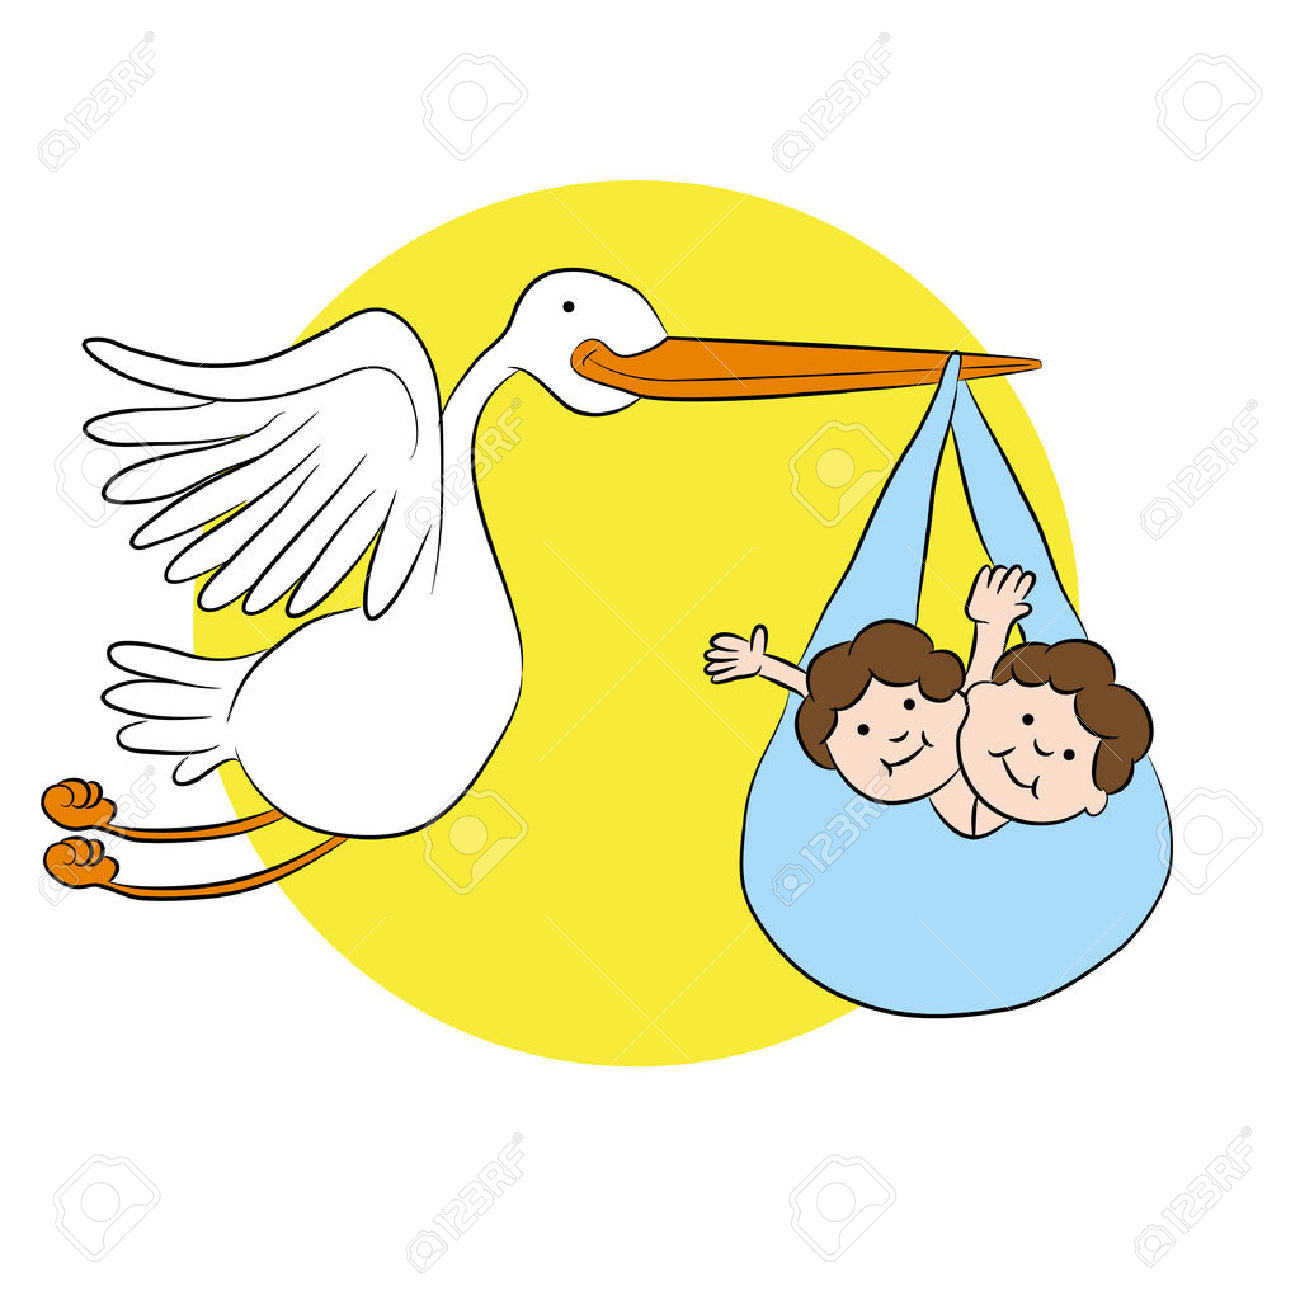 Stork clipart #1, Download drawings